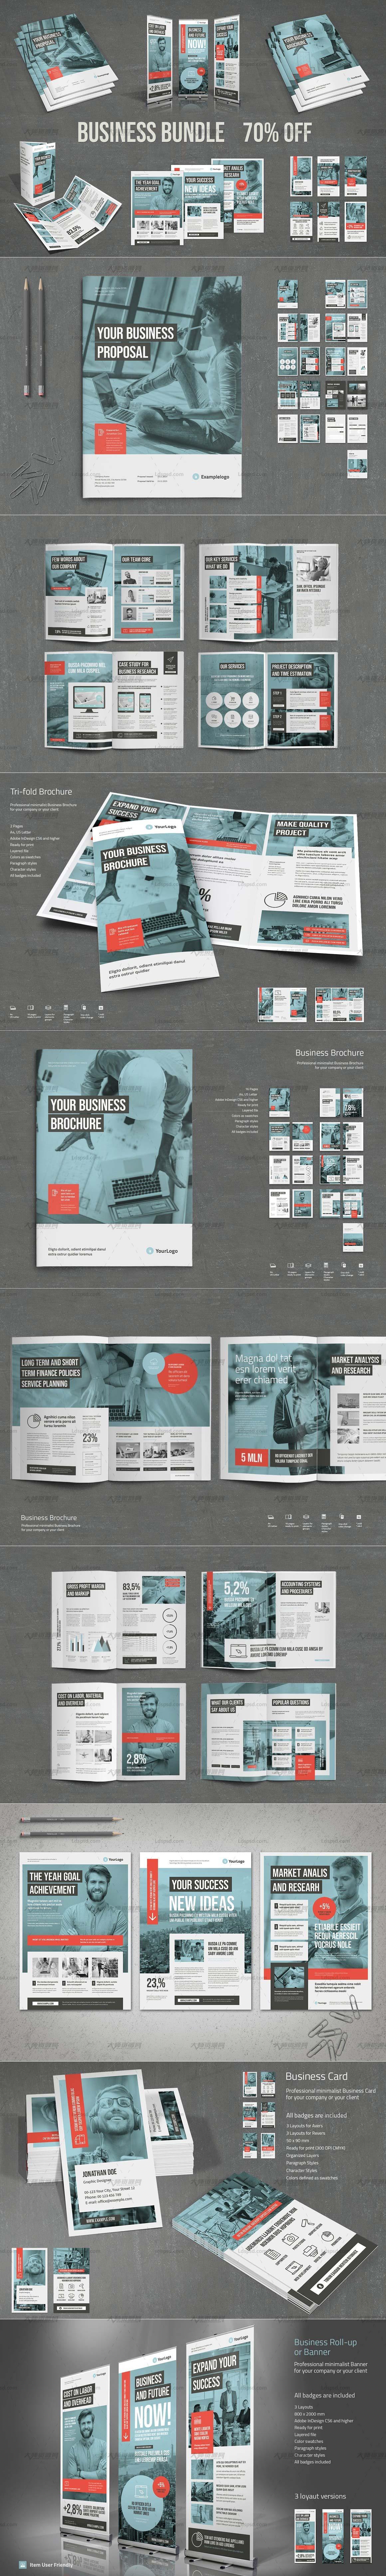 Business Bundle Vol.2.jpg